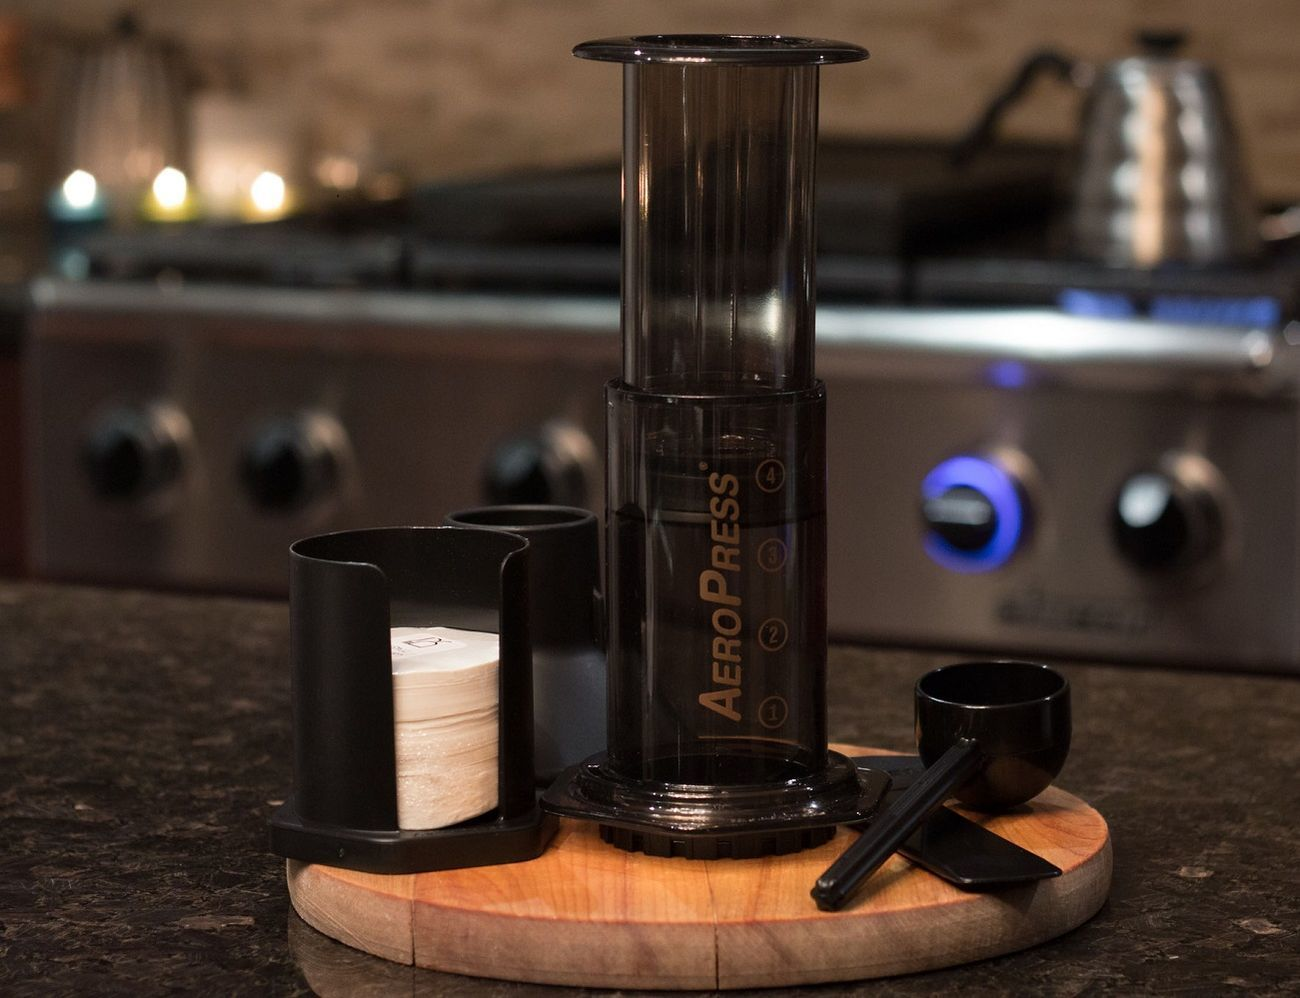 Aerobie Coffee and Espresso Maker From AeroPress